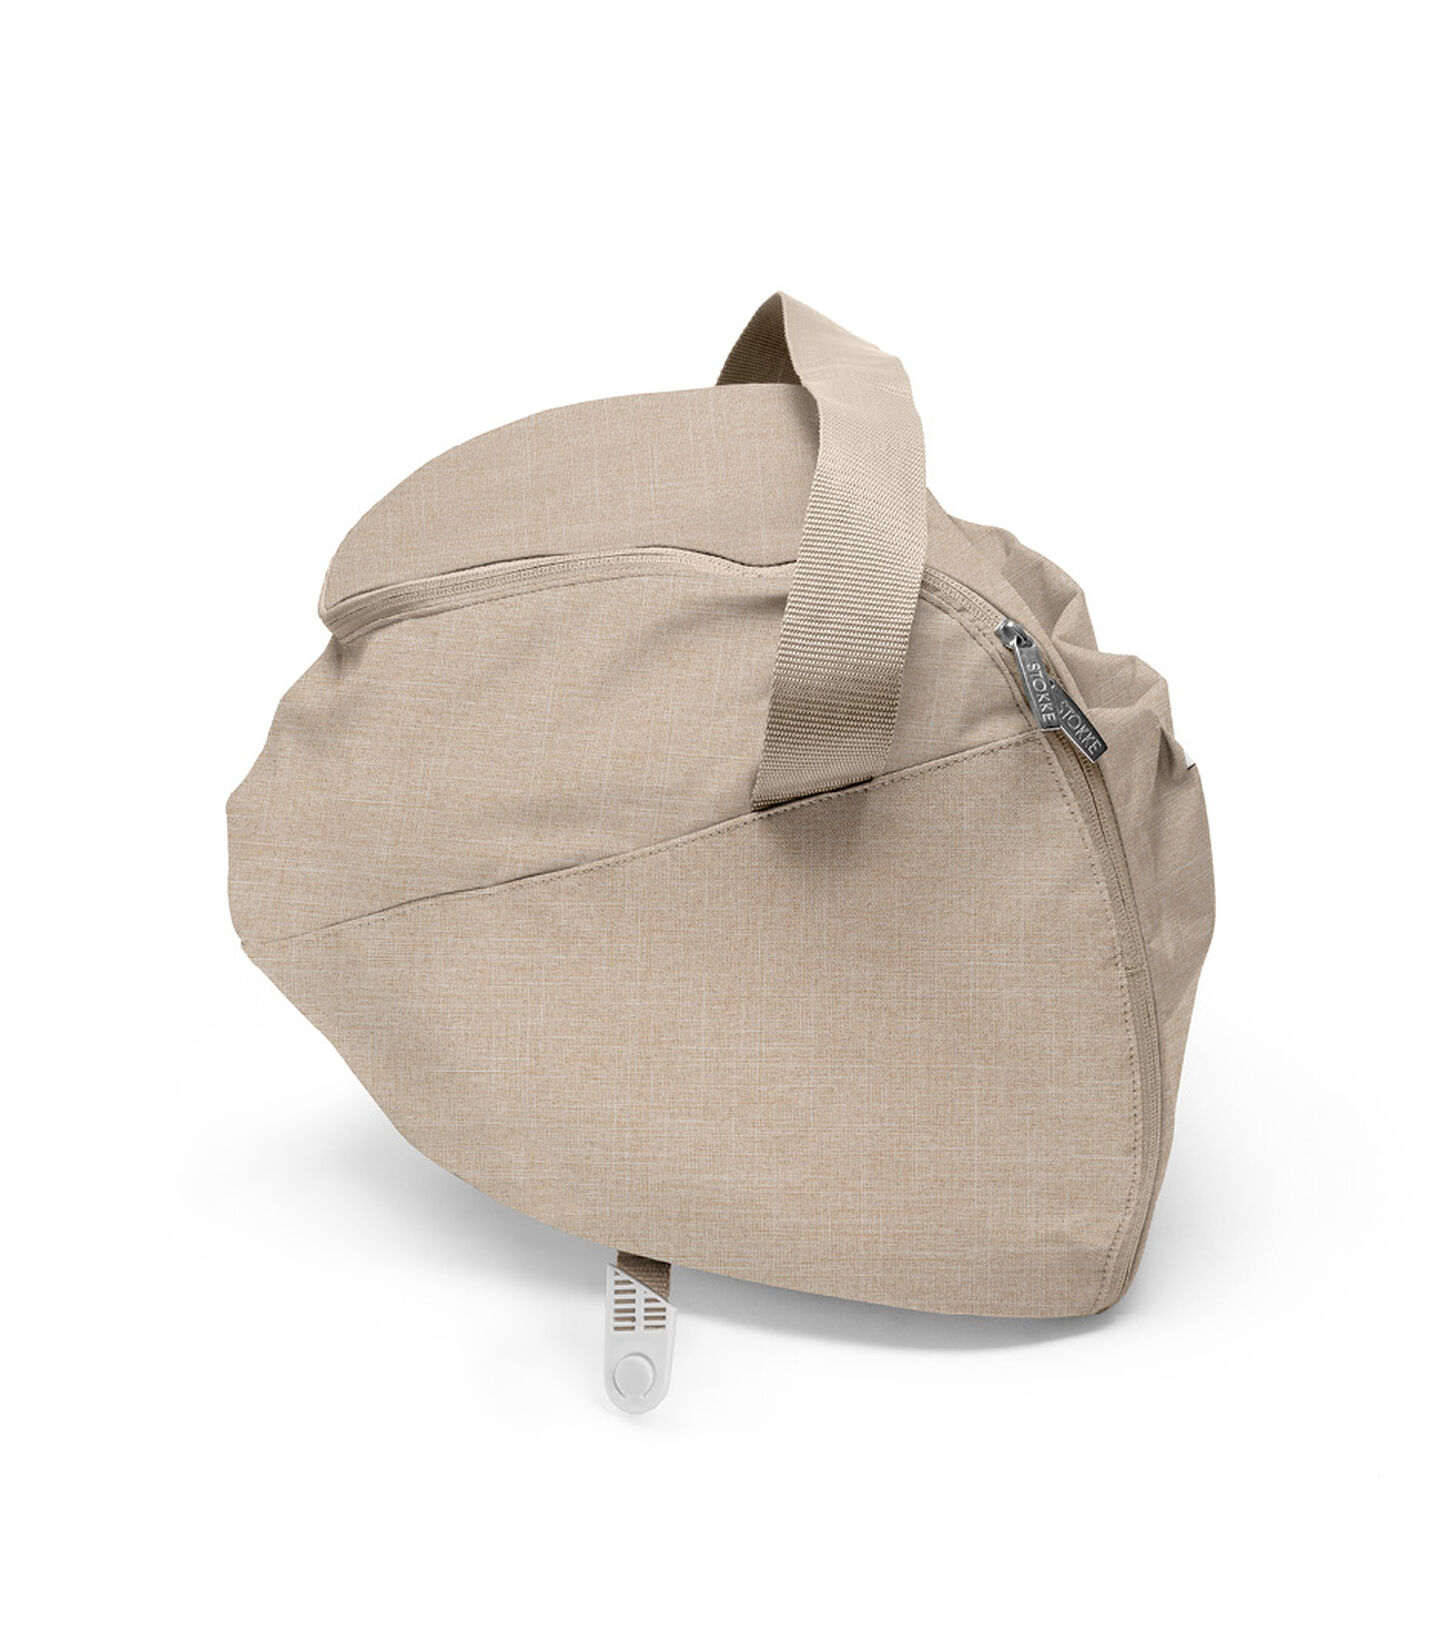 Stokke® Xplory® Shopping Bag V5, Beige Melange. view 2